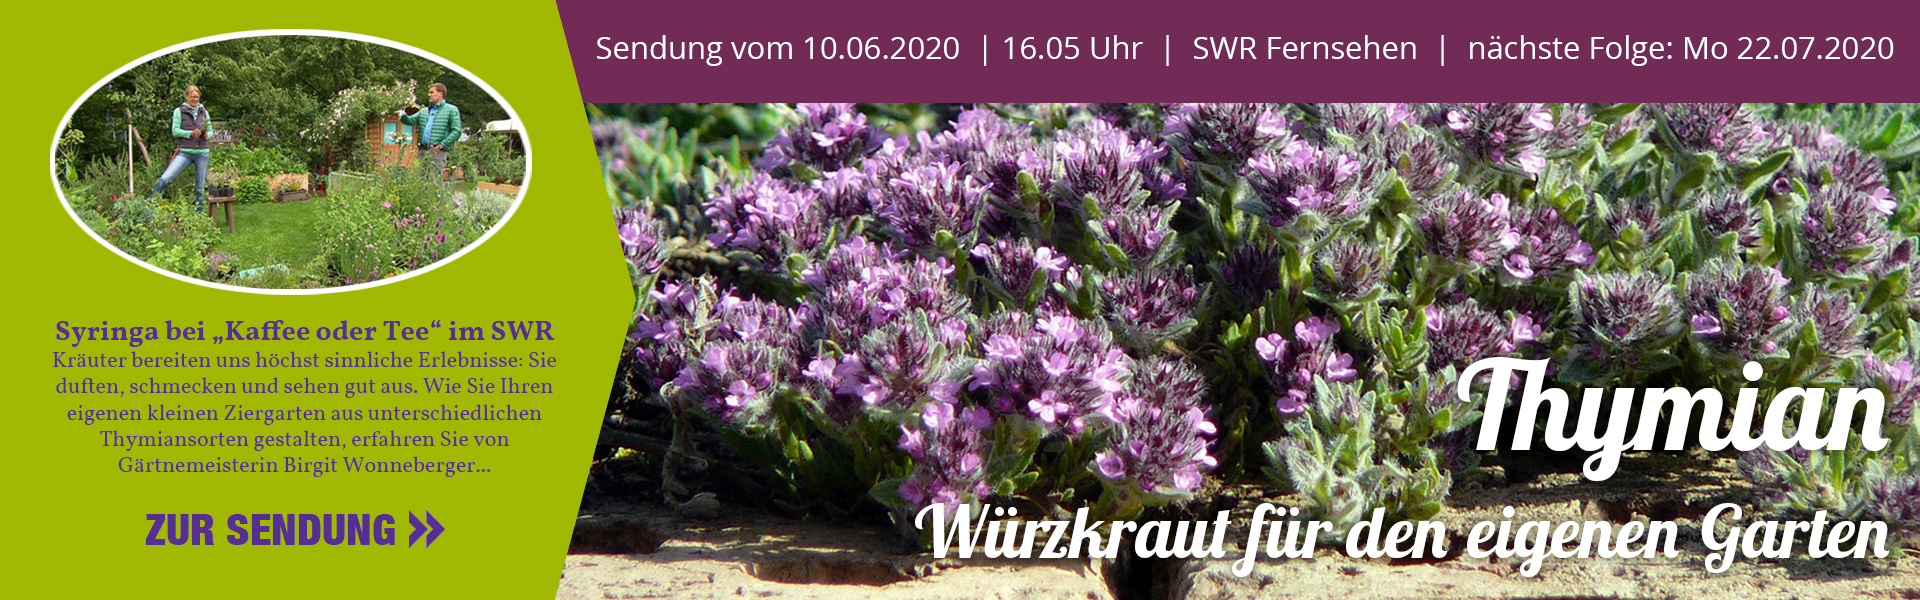 SWR_SENDUNG_10.06.2020